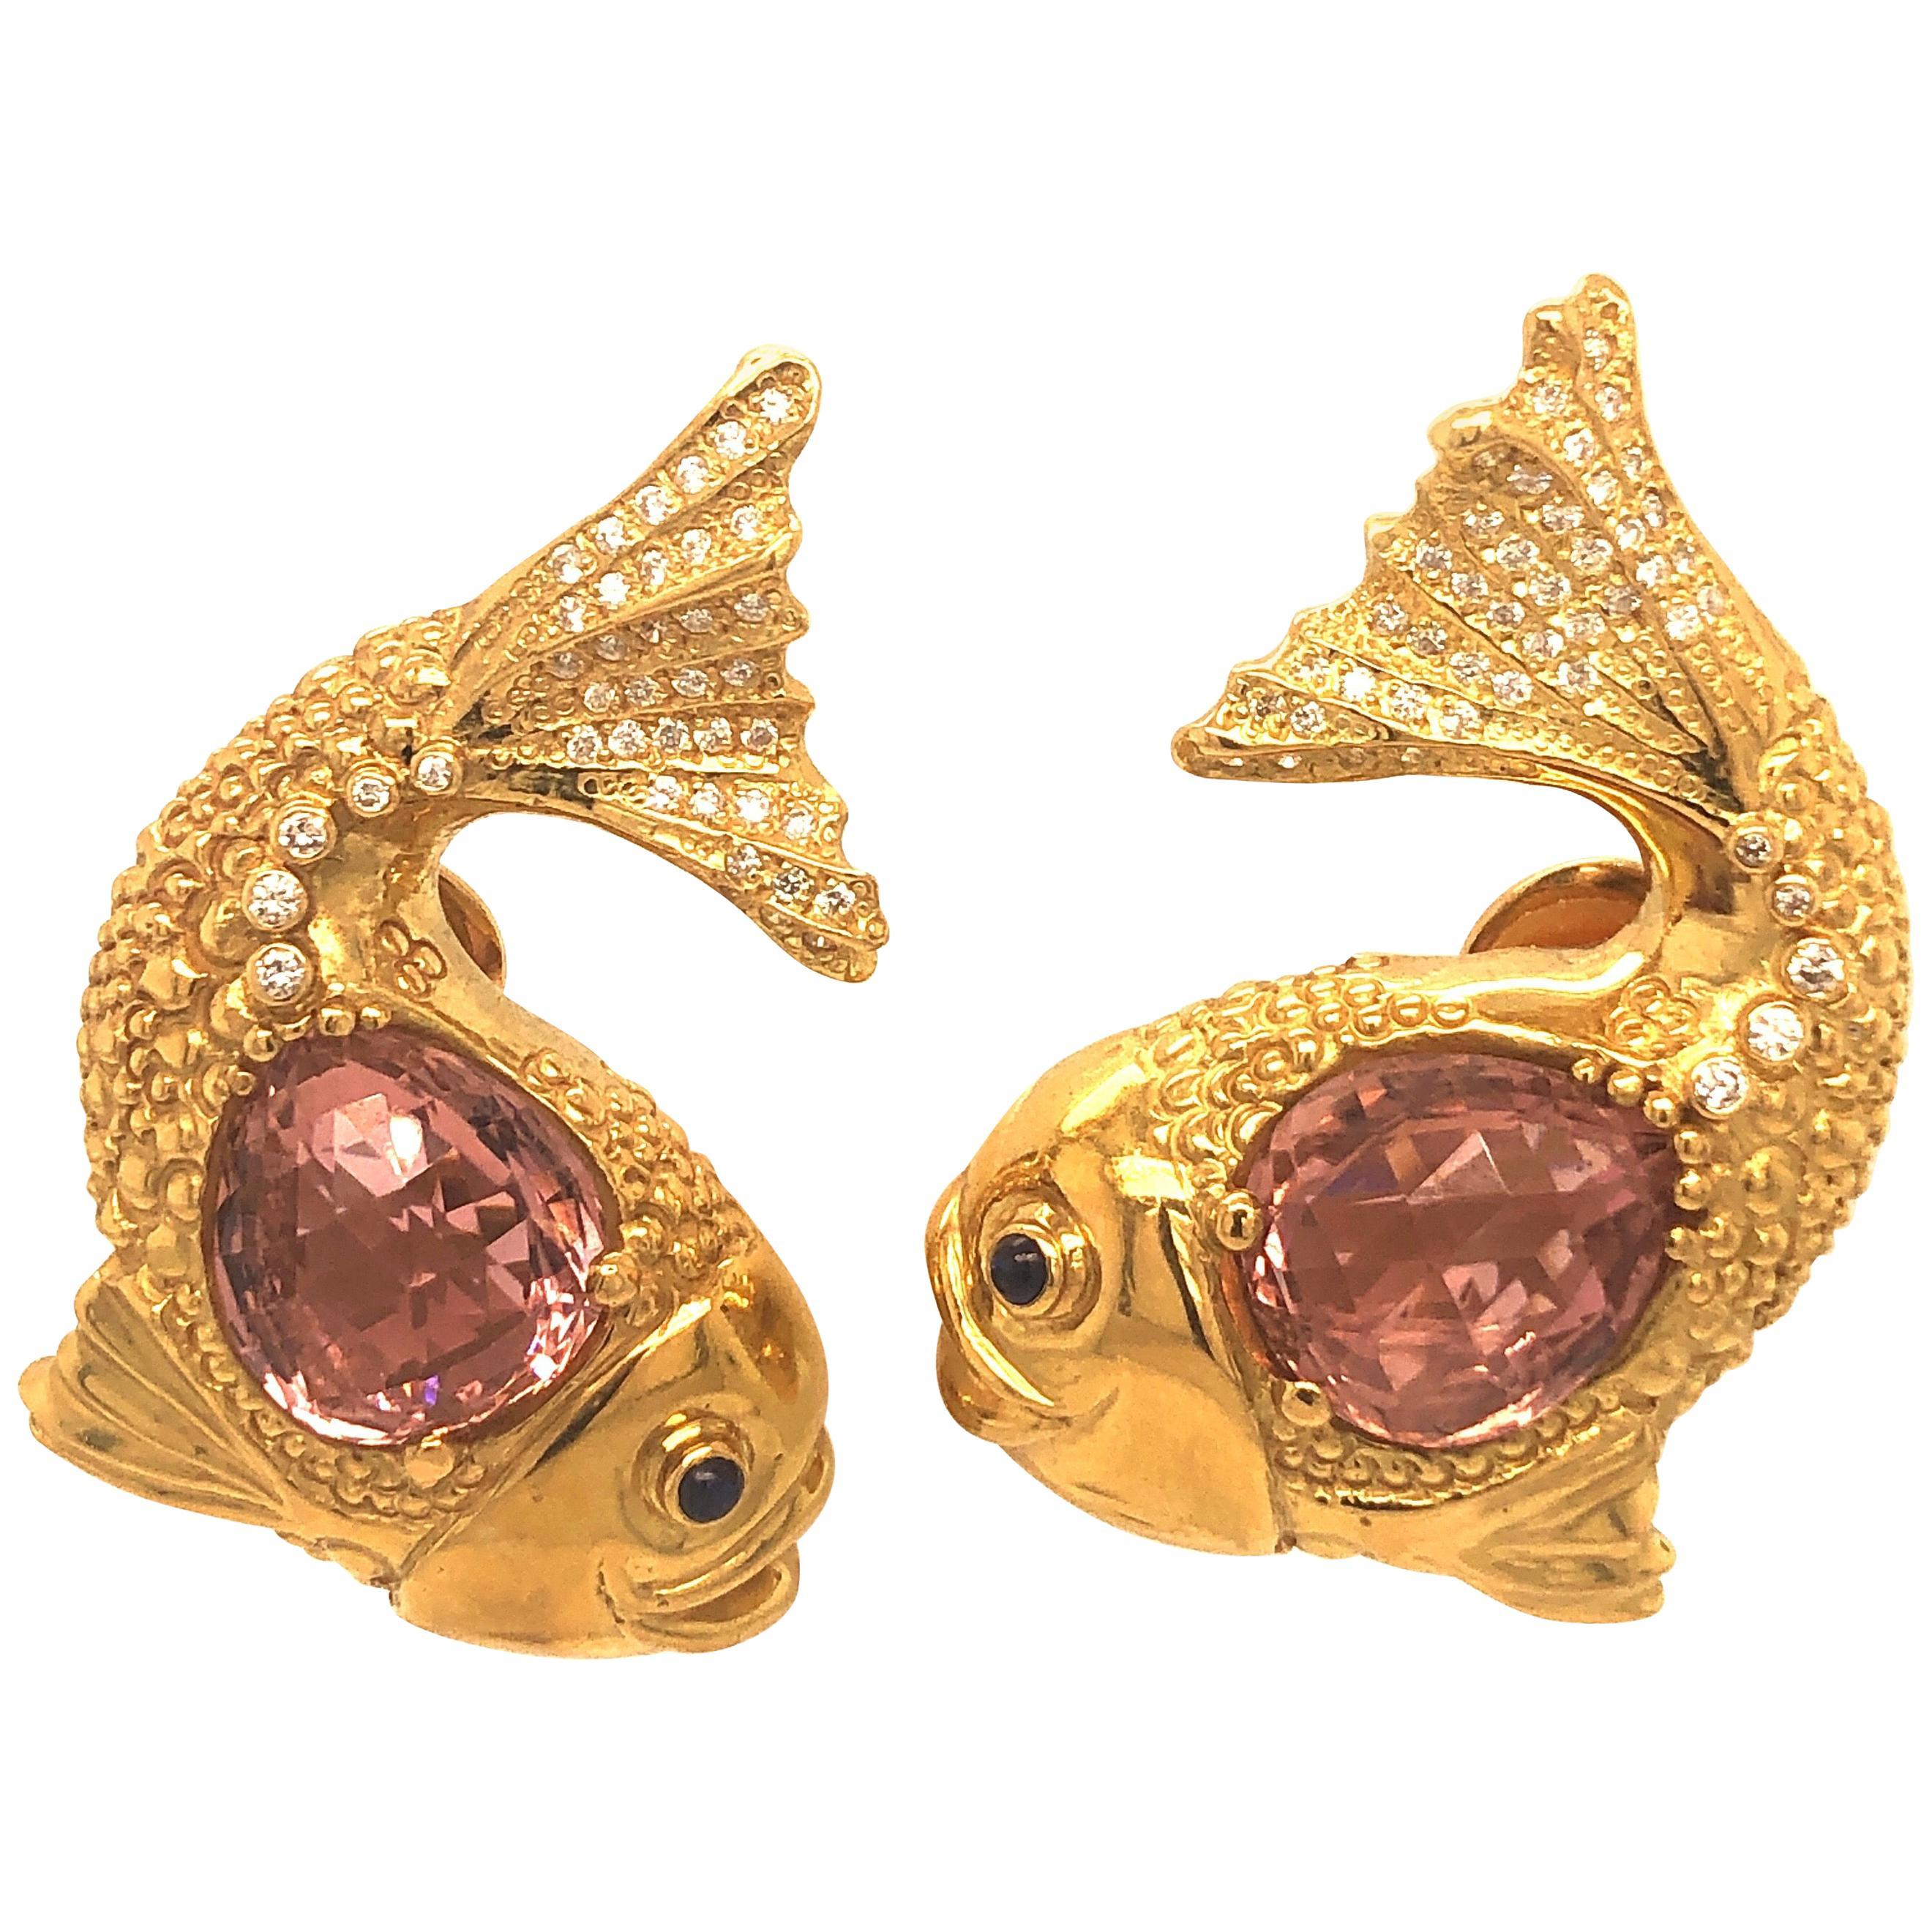 Elizabeth Gage Yellow Gold and Pink Tourmaline Diamond Fish Earrings